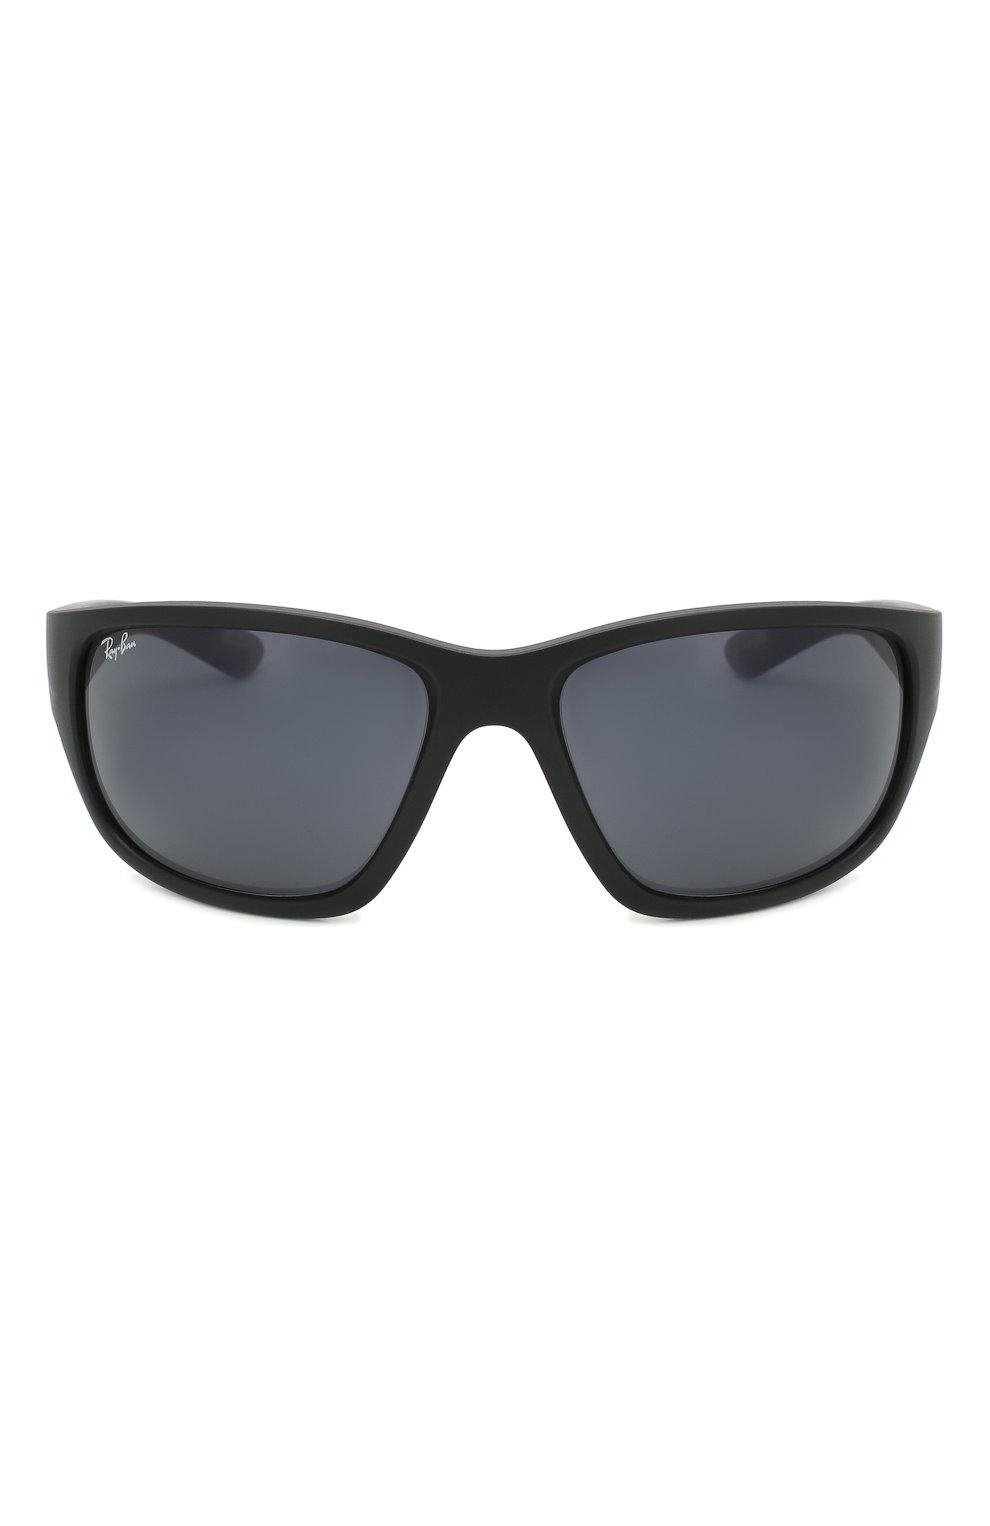 Мужские солнцезащитные очки RAY-BAN черного цвета, арт. 4300-601SR5 | Фото 2